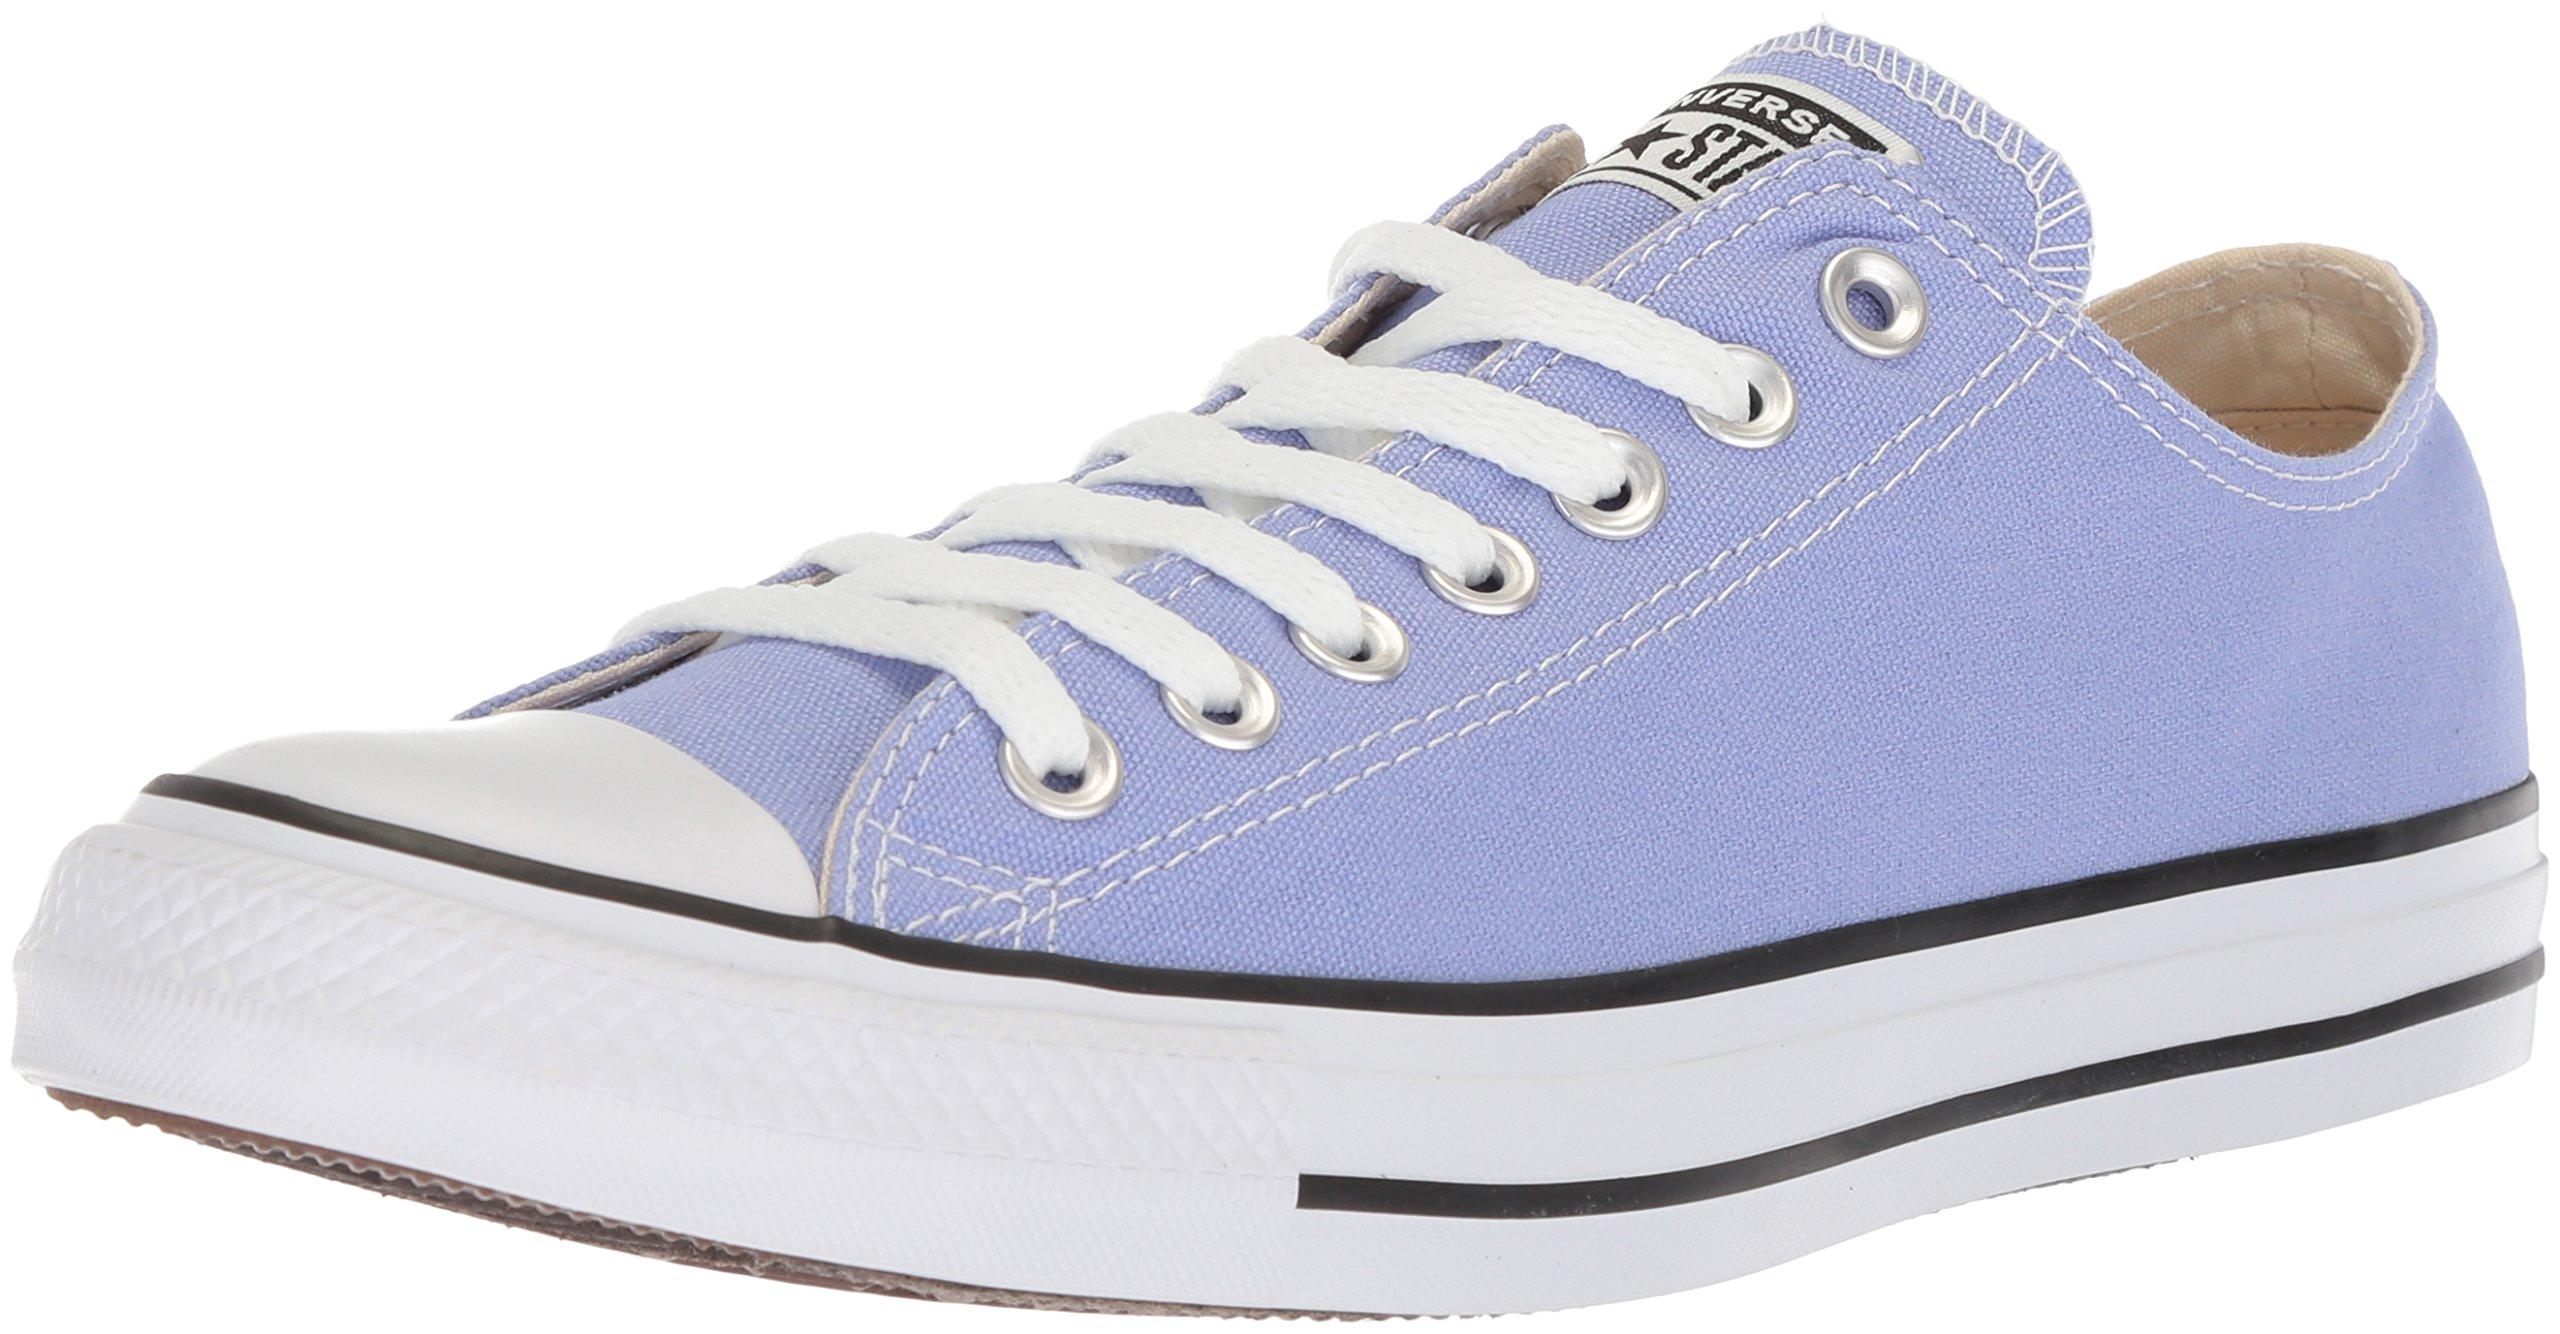 Converse Chuck Taylor All Star Seasonal Canvas Low Top Sneaker, Twilight Pulse, 6.5 US Men/8.5 US Women